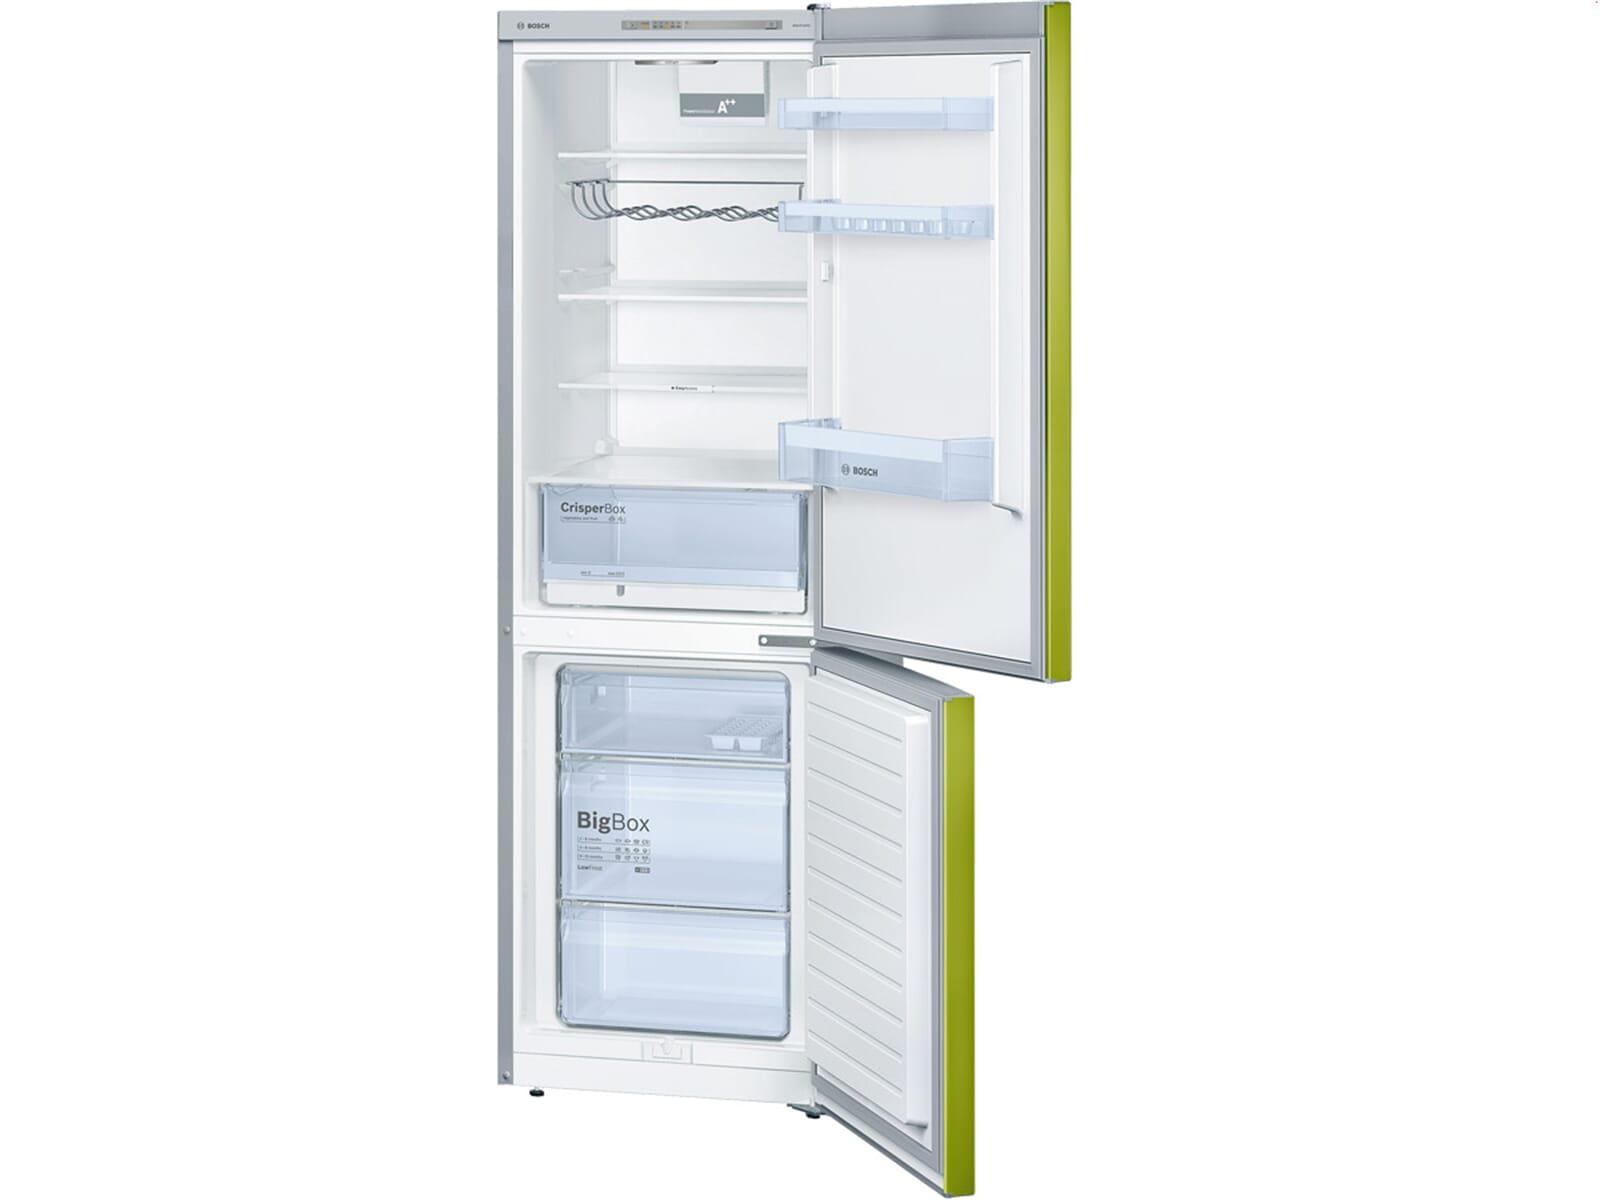 Bosch Kühlschrank Kgn 39 Xi 45 : Gefrierschrank media markt bosch kühlschrank kgn xi